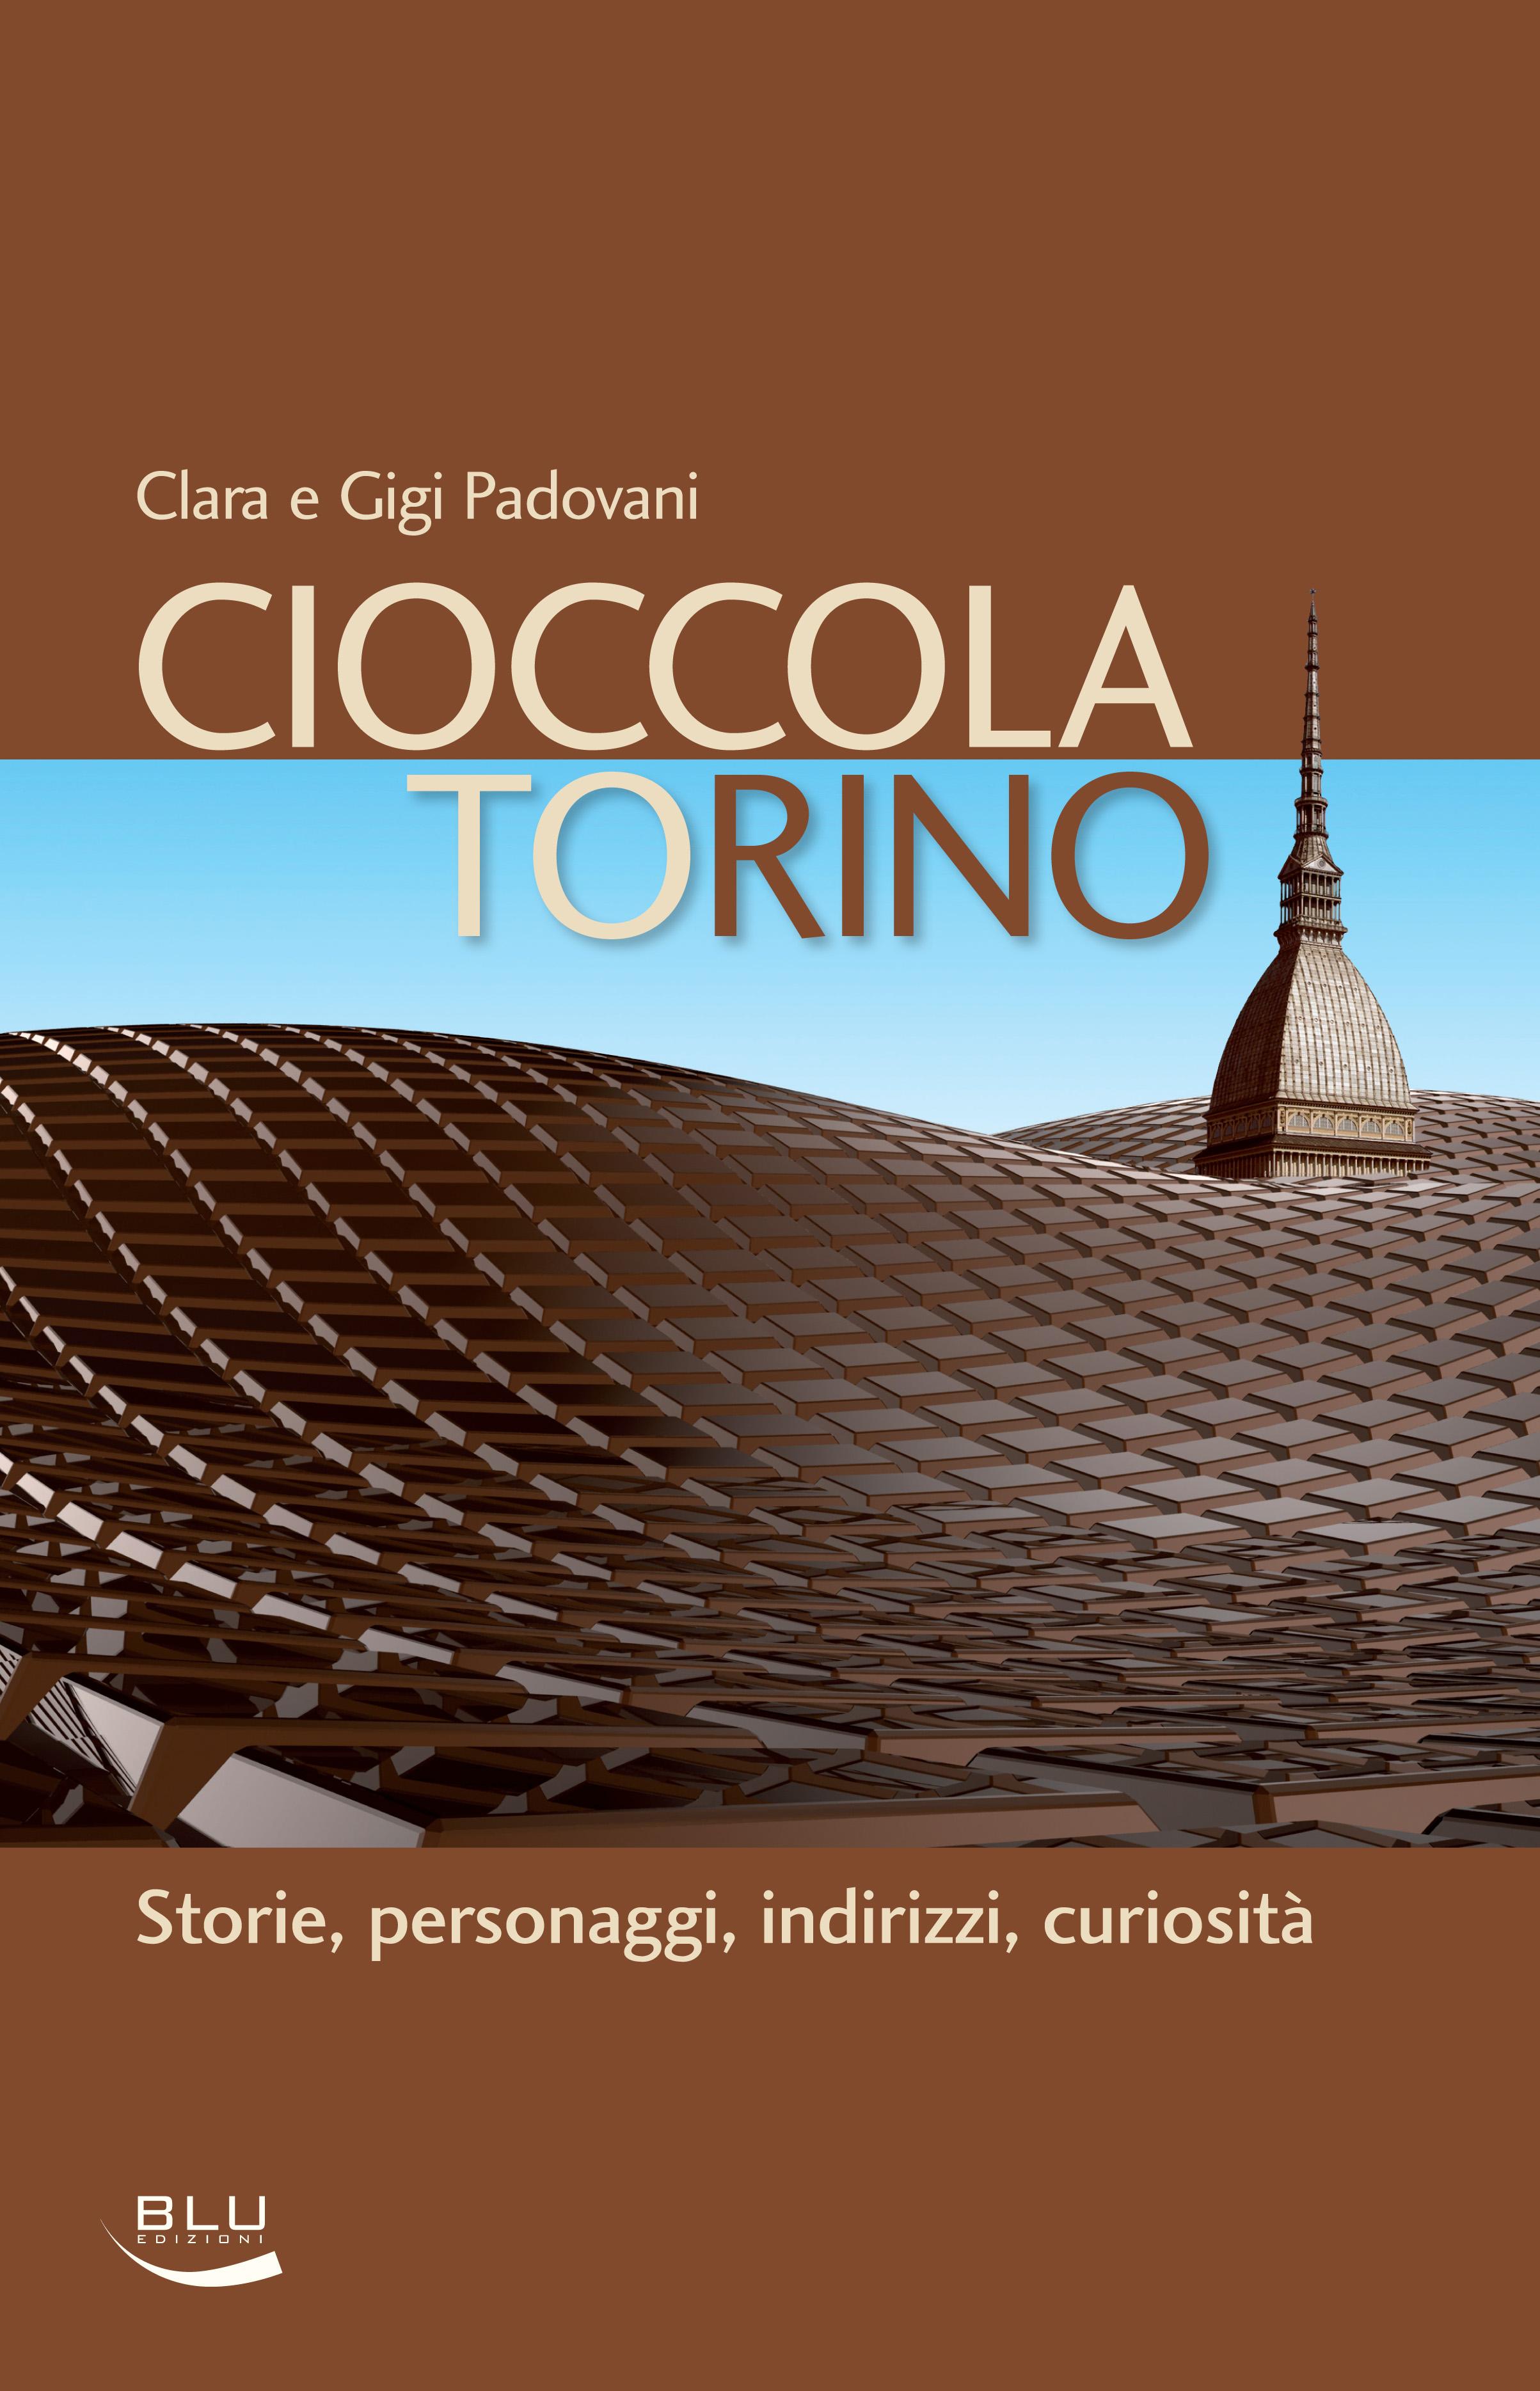 Copertina CioccolaTorino